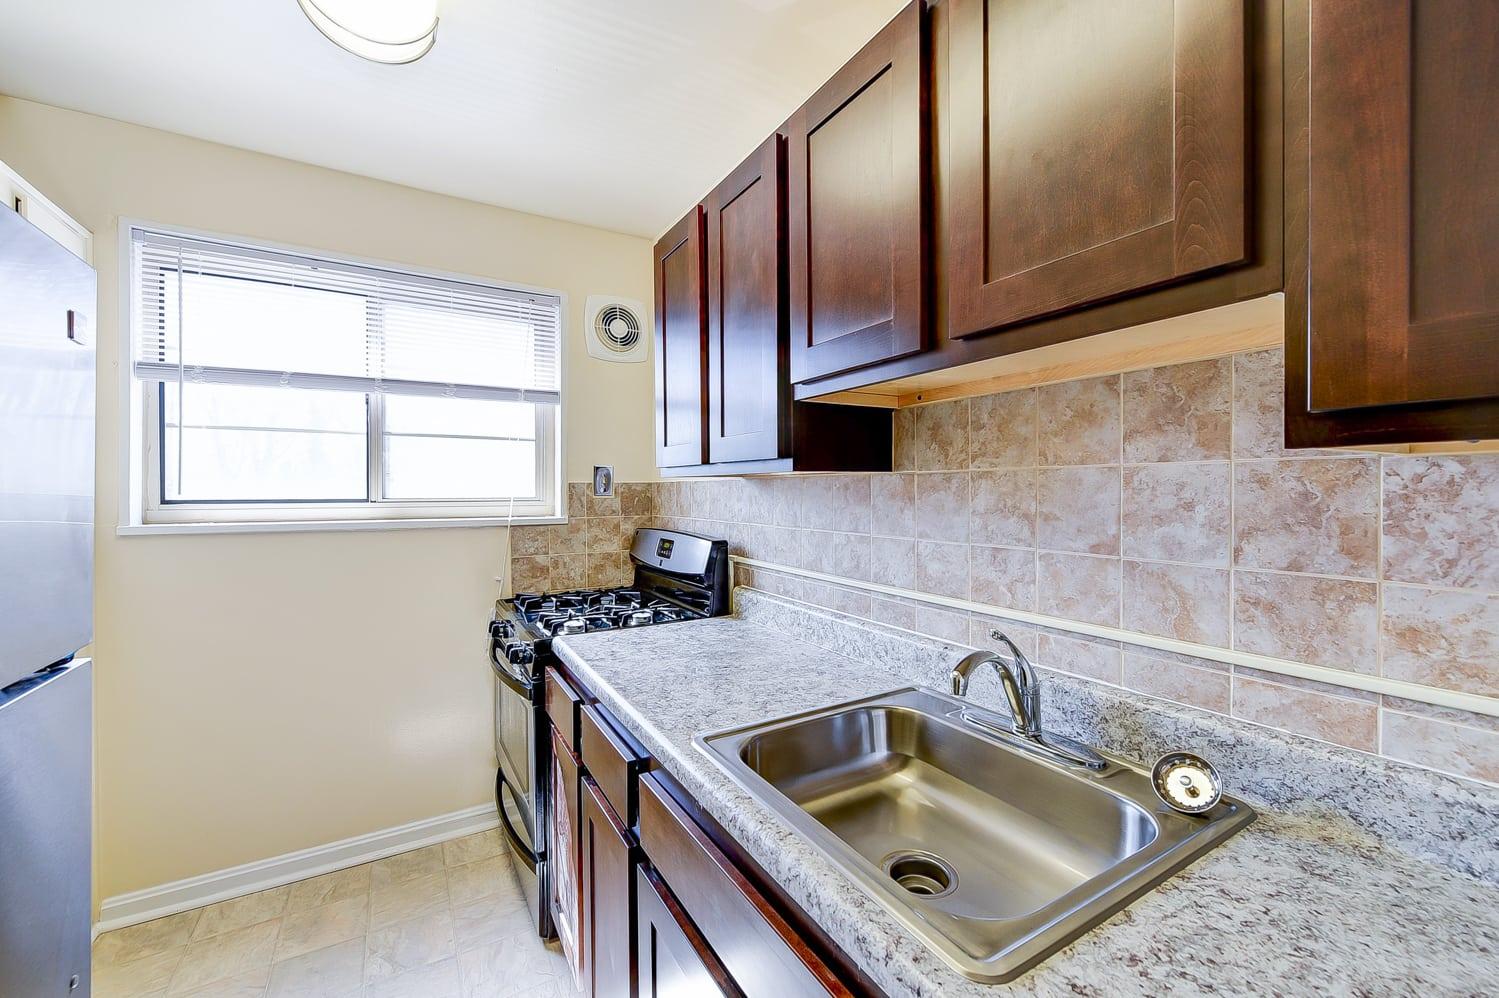 Commercial Kitchen Rental Washington Dc